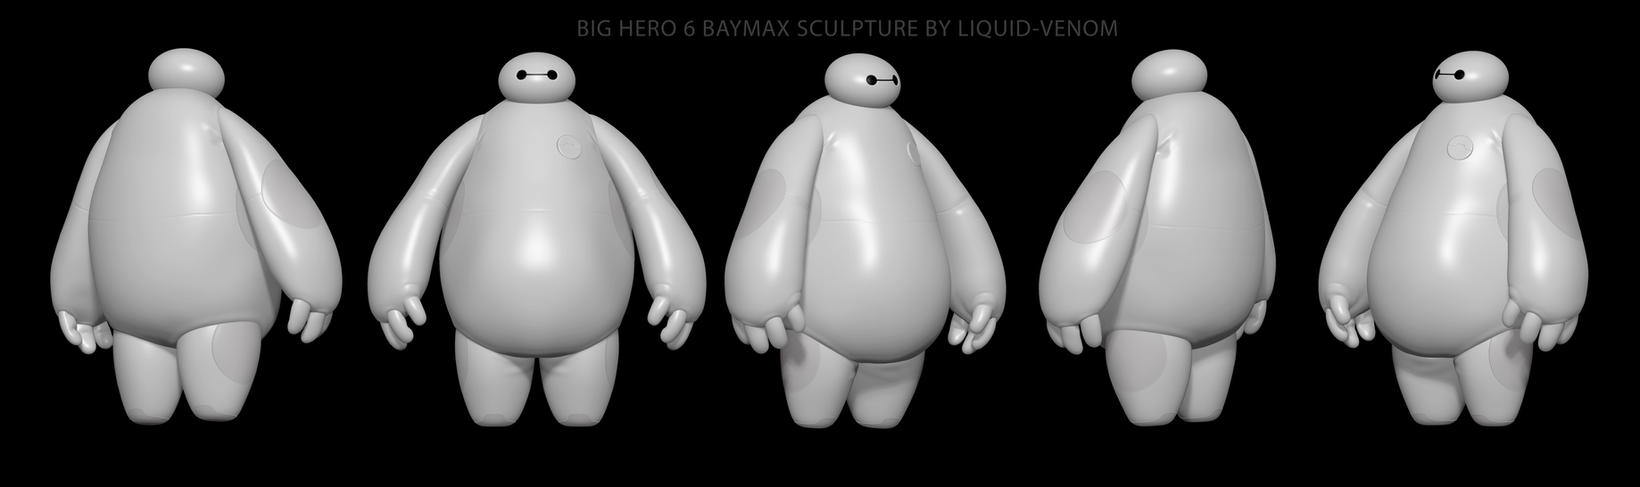 BAYMAX by liquid-venom